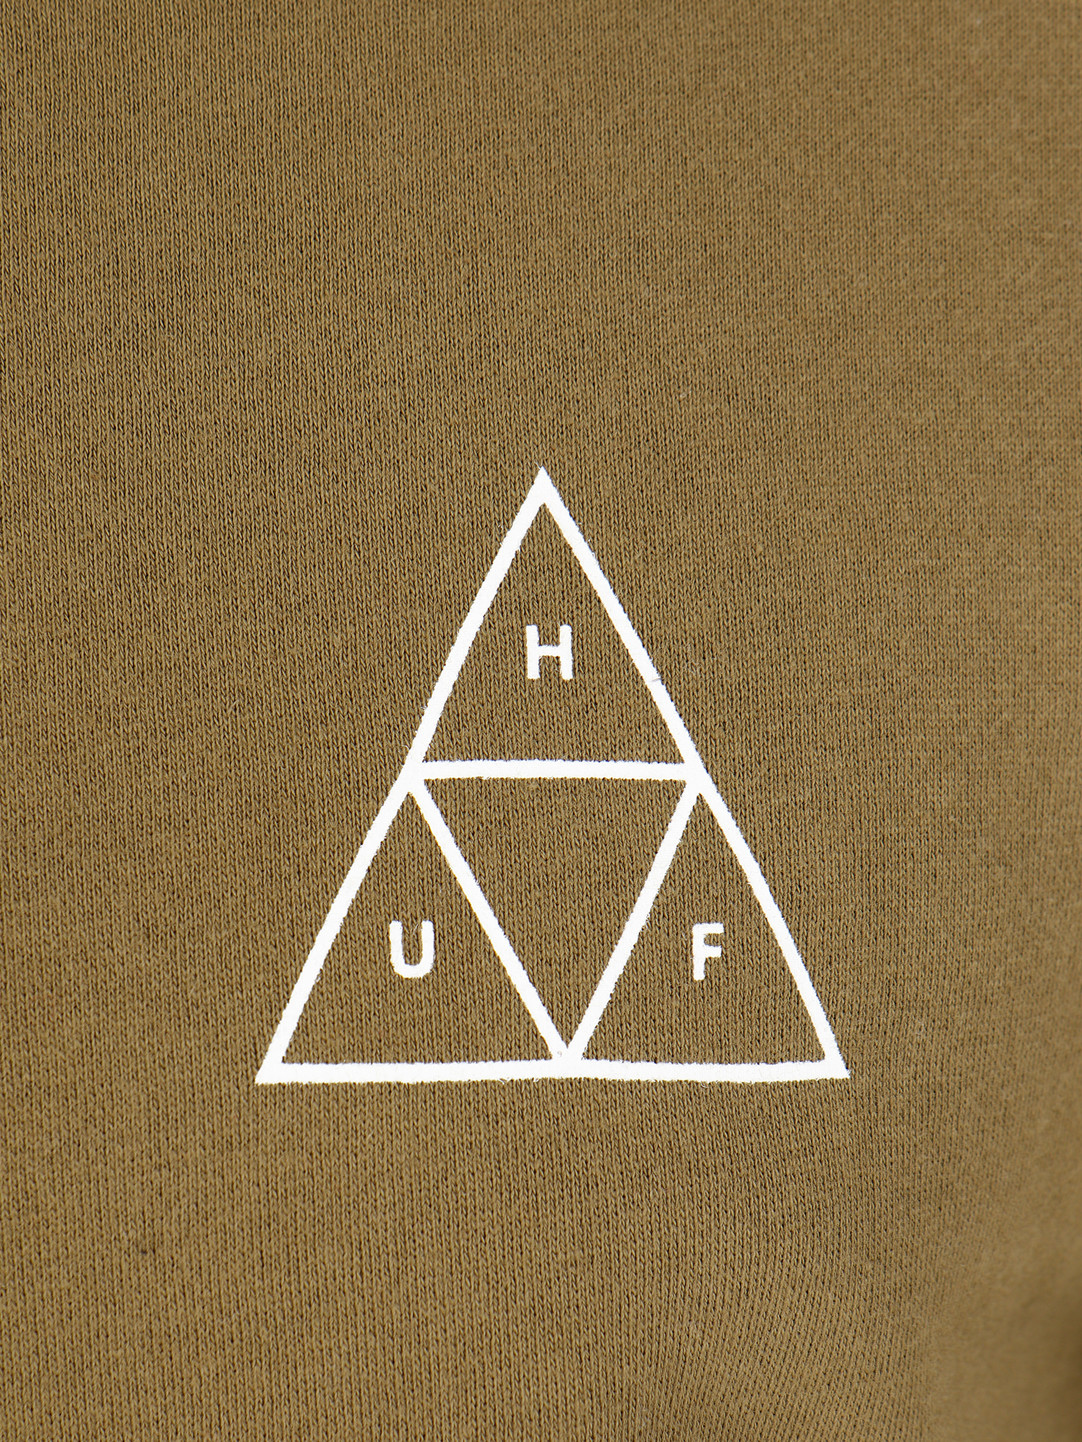 HUF HUF Essentials Tt Crew Martini Olive Pf00101Marol